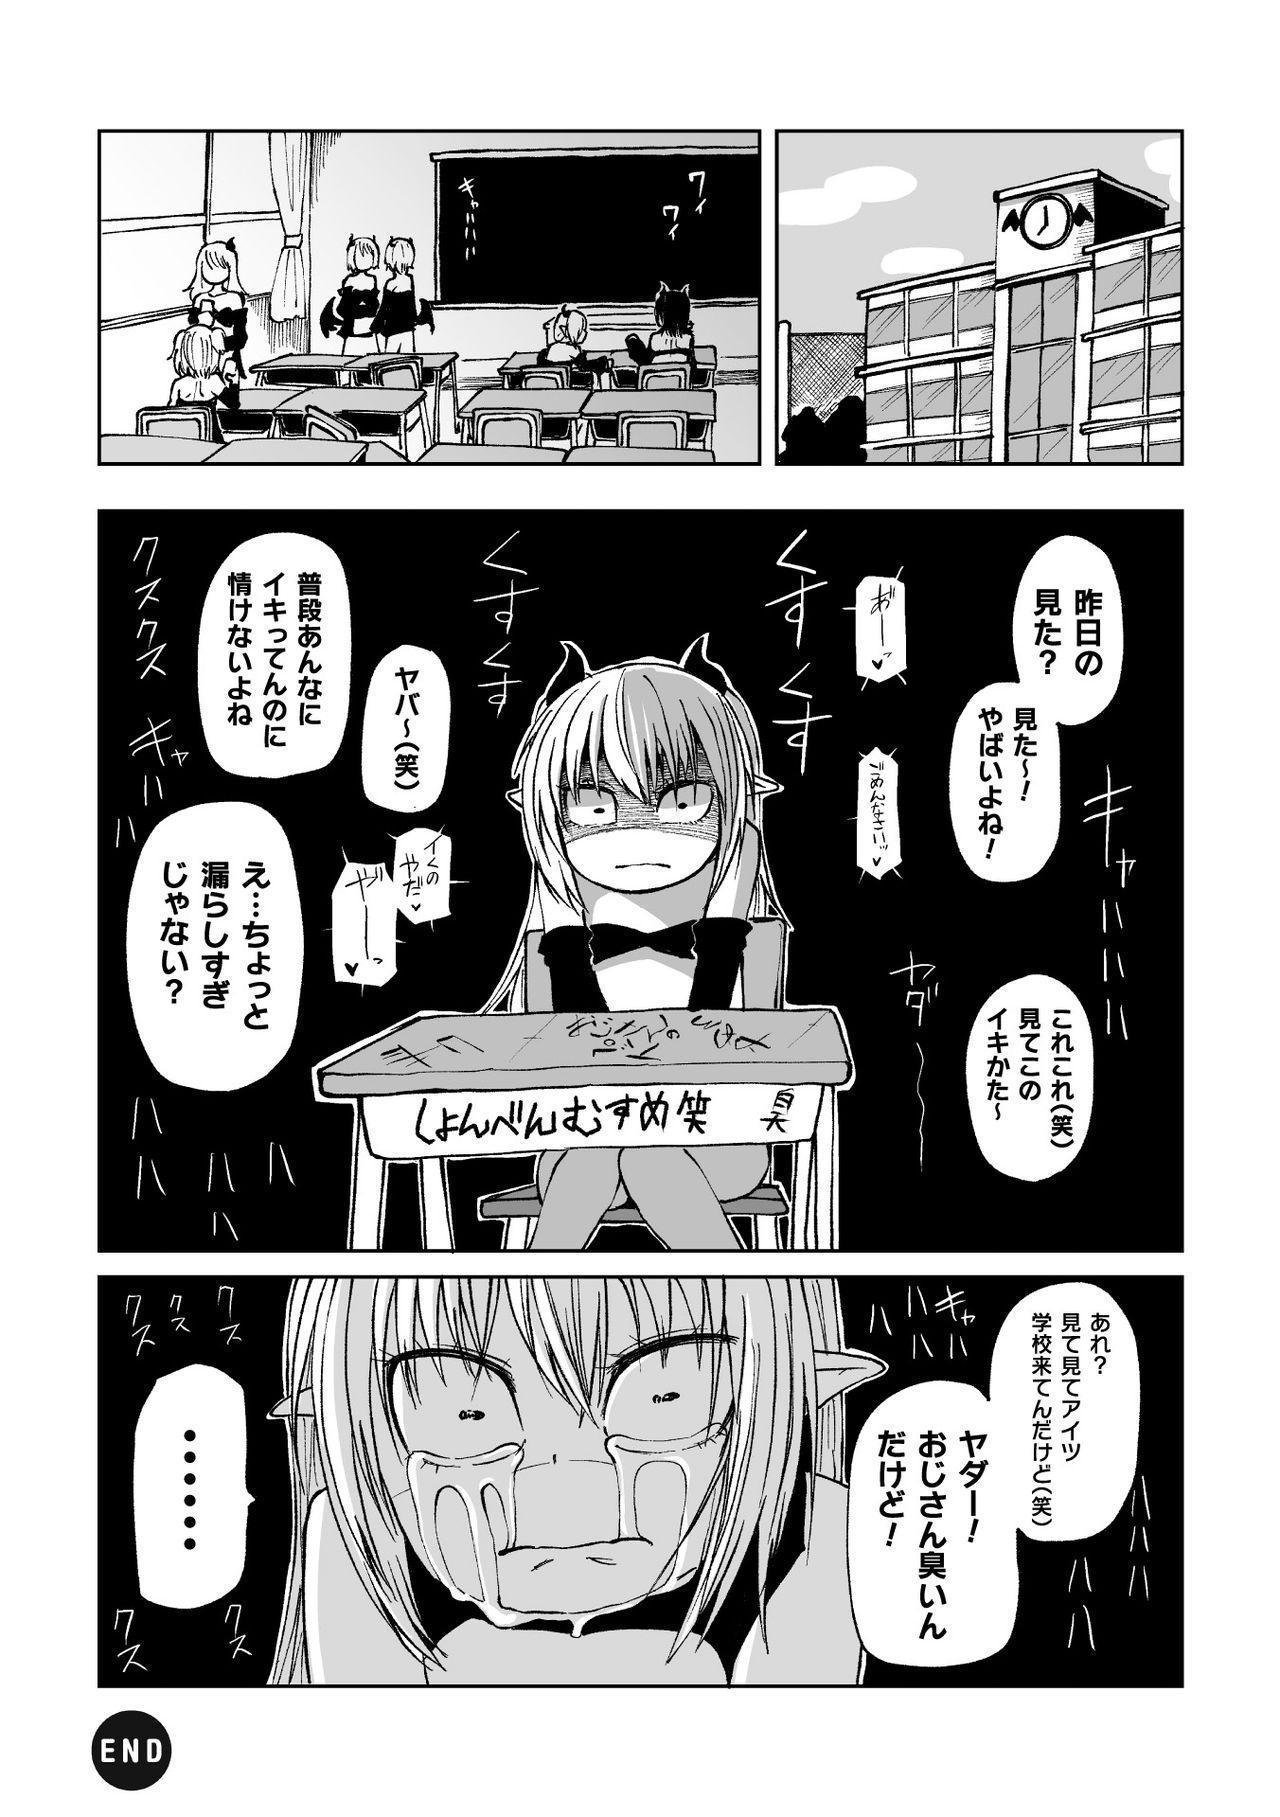 [Anthology] 2D Comic Magazine Mesugaki Succubus Seisai Namaiki Aka-chan Heya o Wakarase-bou de Kousei Knock Vol. 2 [Digital] 83